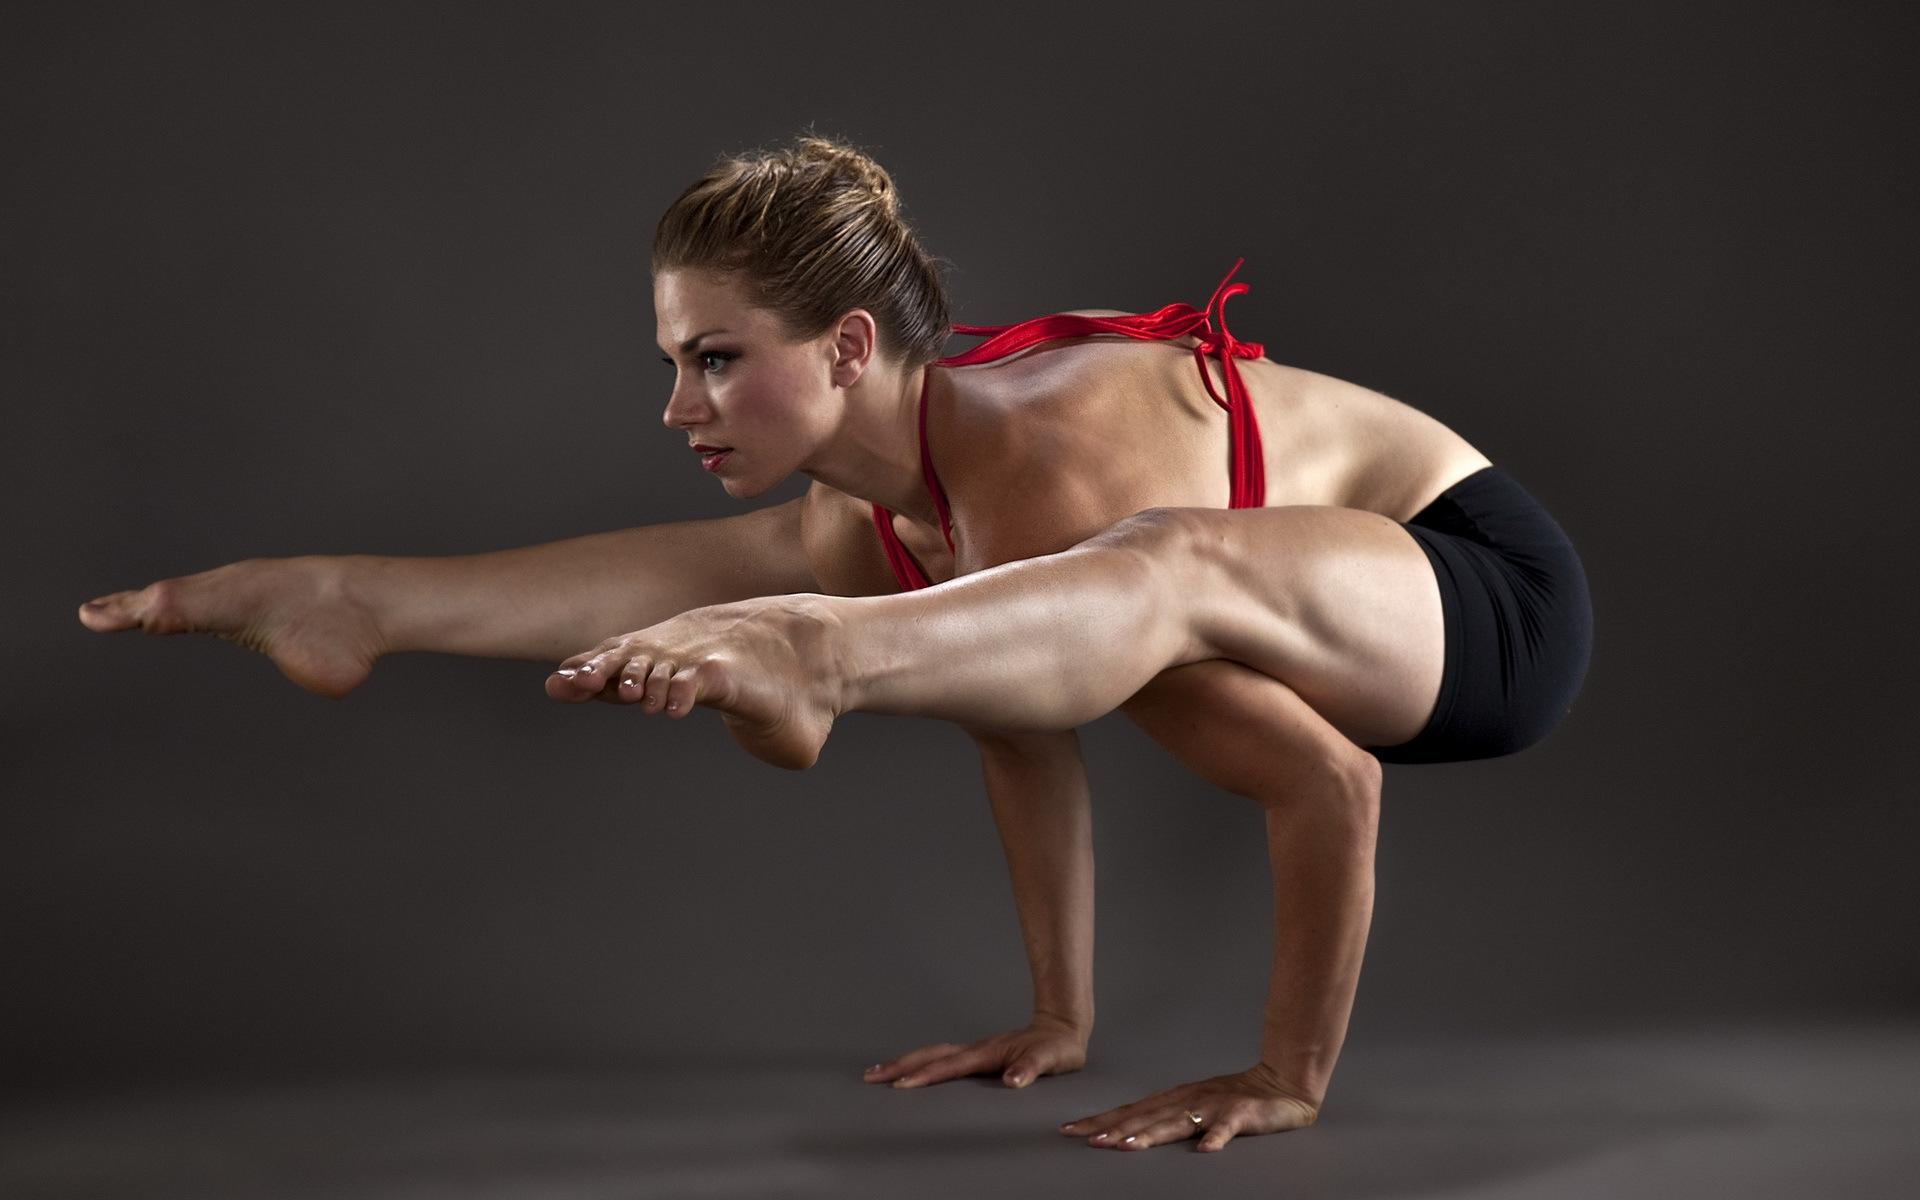 картинки гимнастки модели